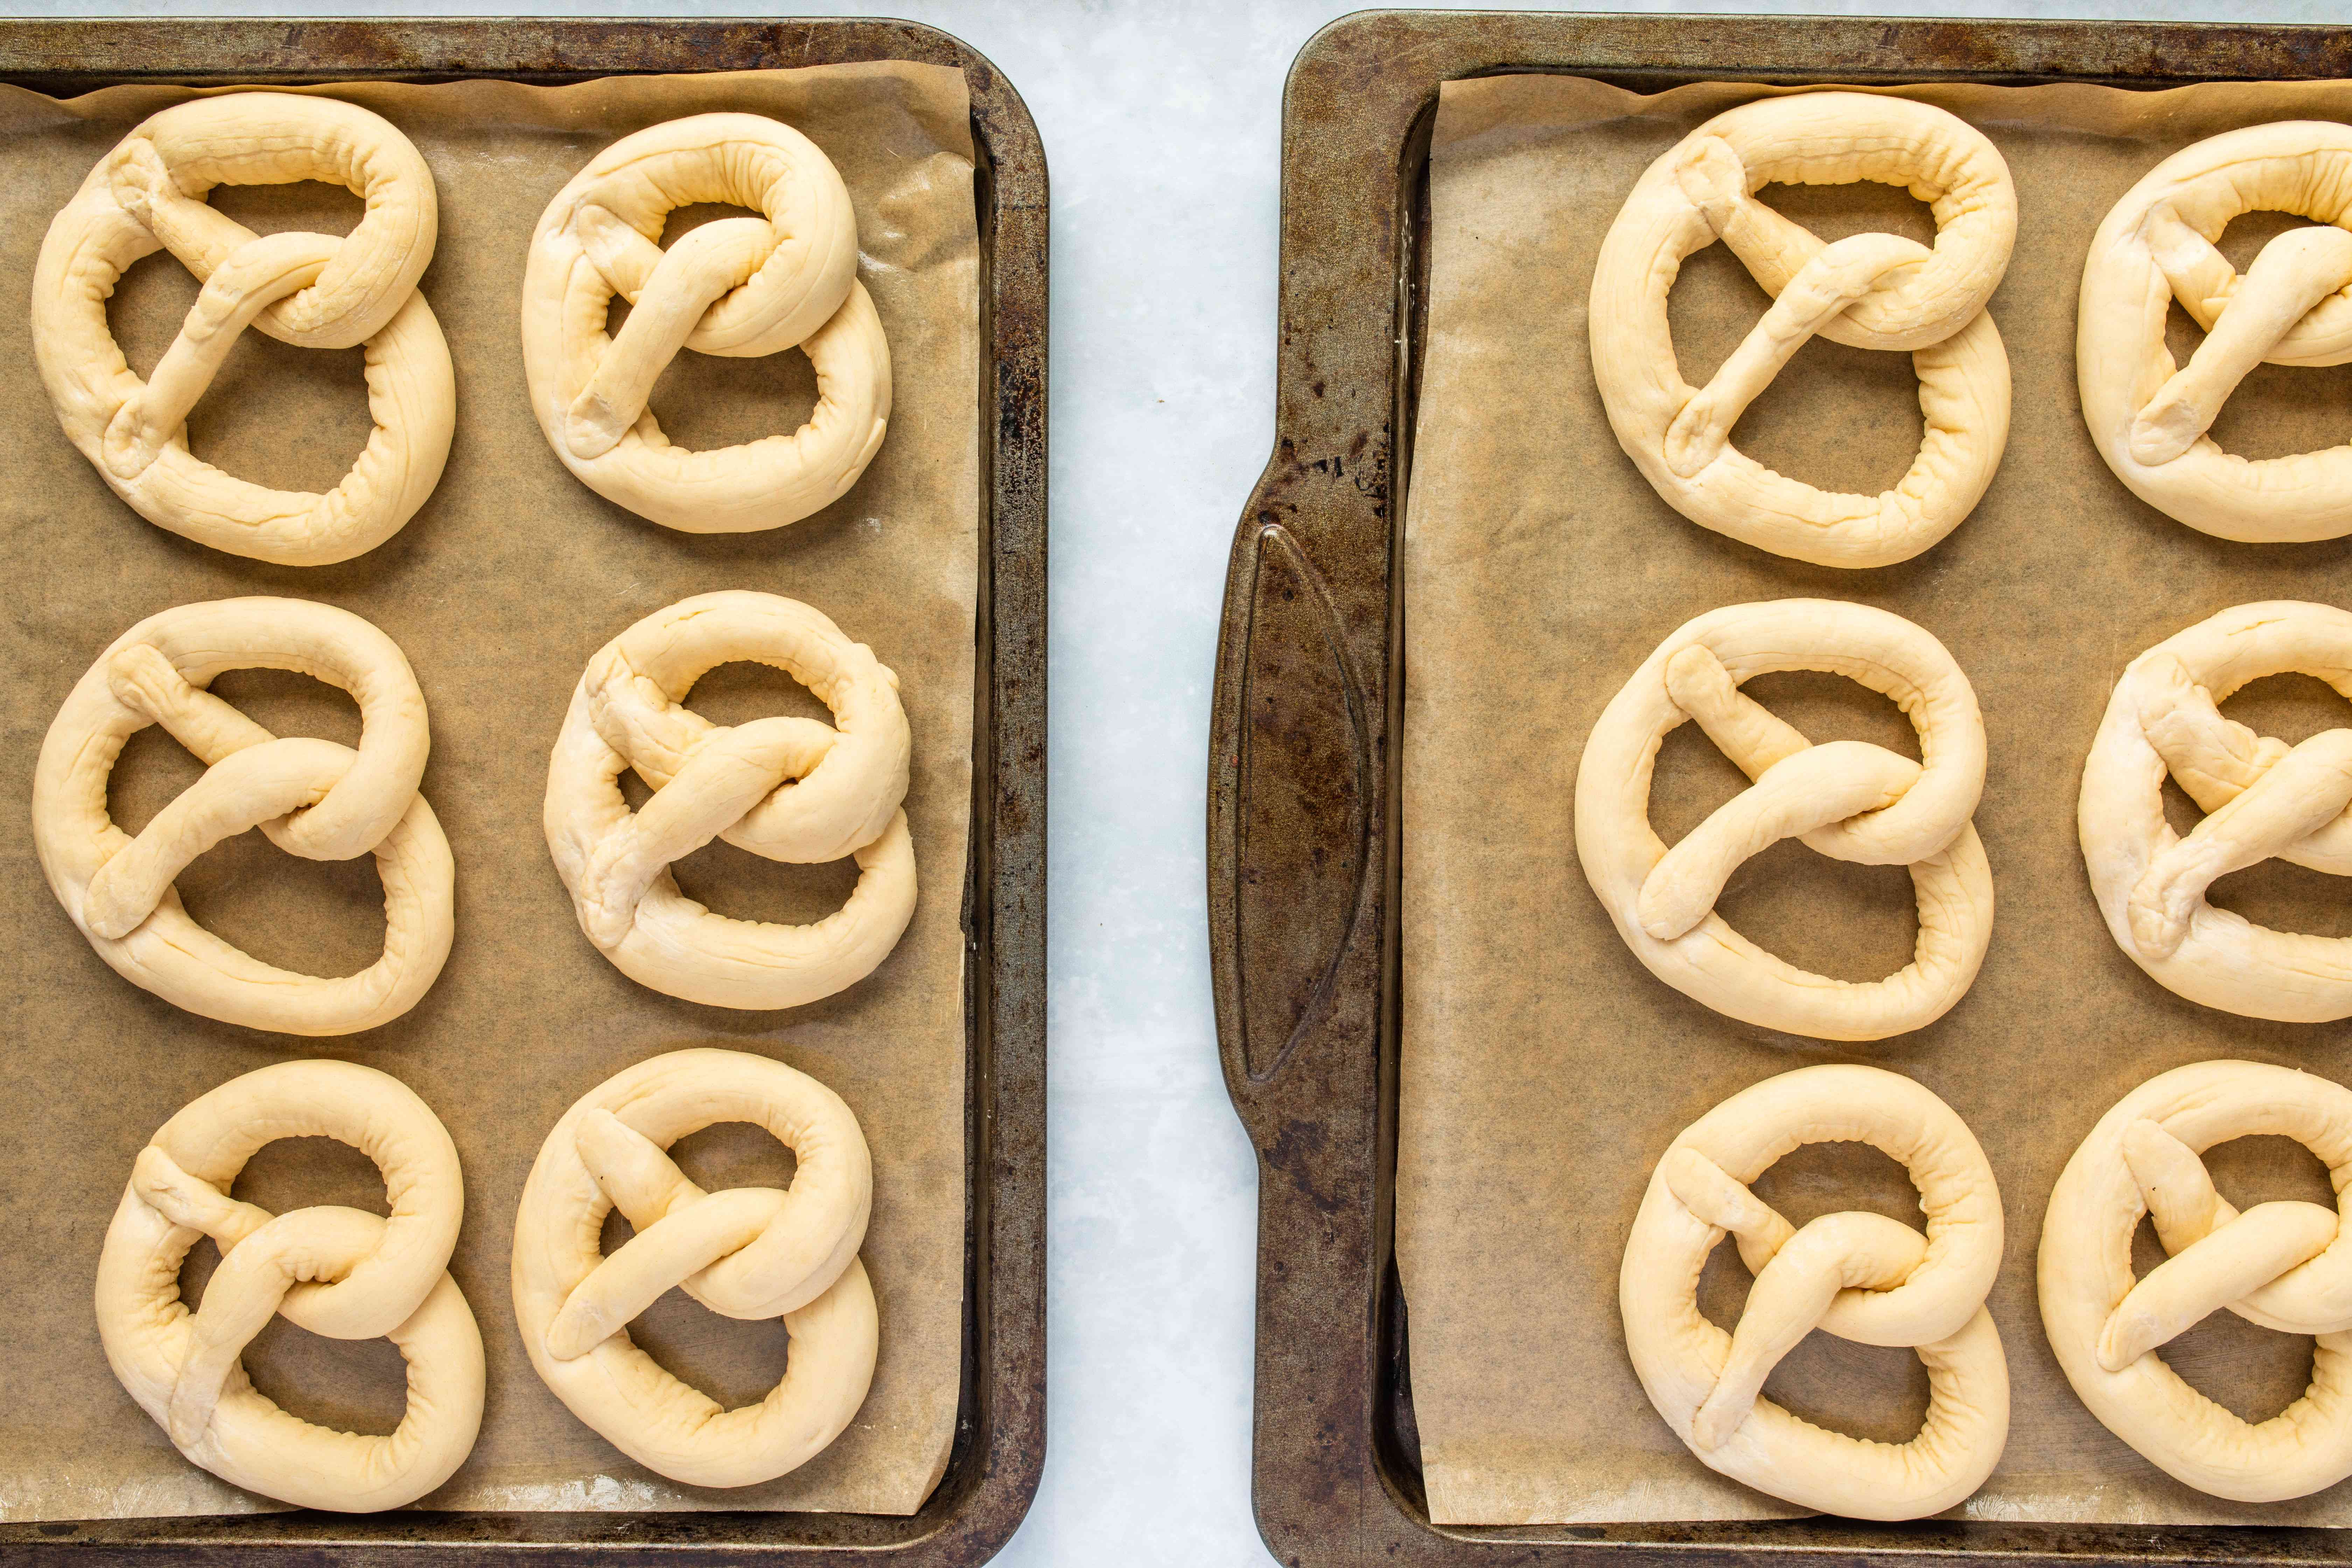 Place pretzels on baking sheet